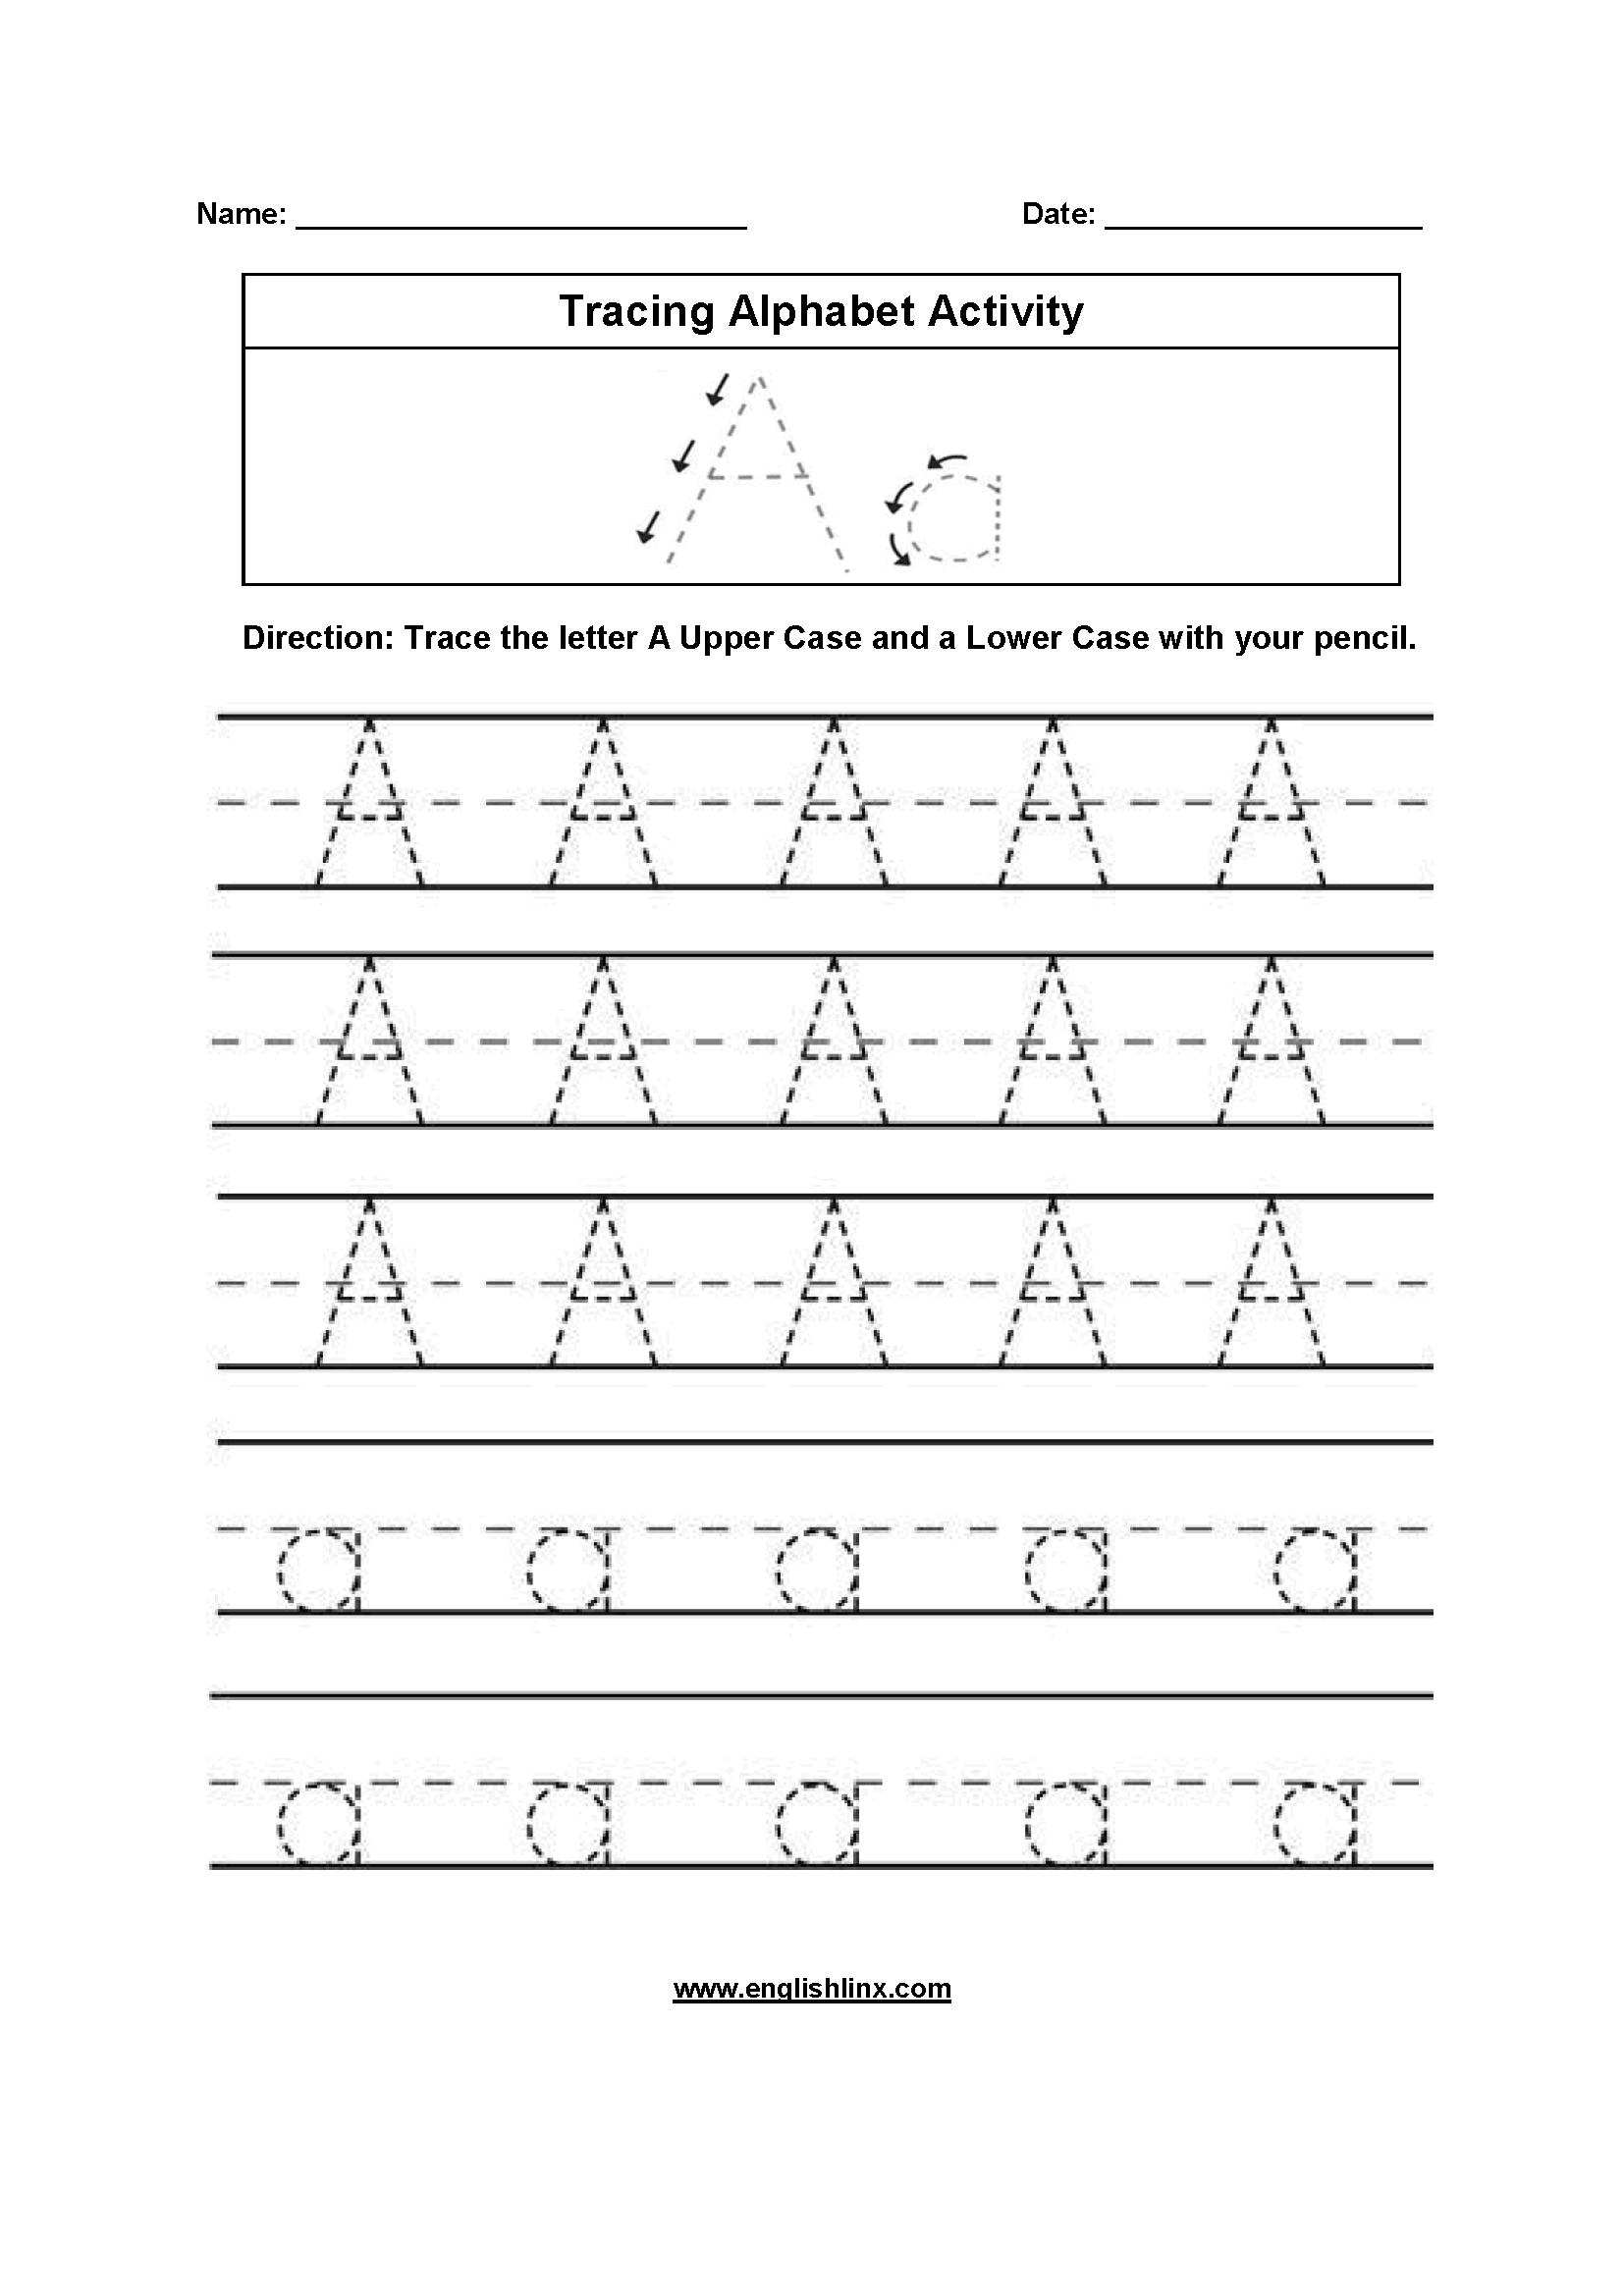 Alphabet Worksheets | Tracing Alphabet Worksheets regarding Grade R Alphabet Worksheets Pdf